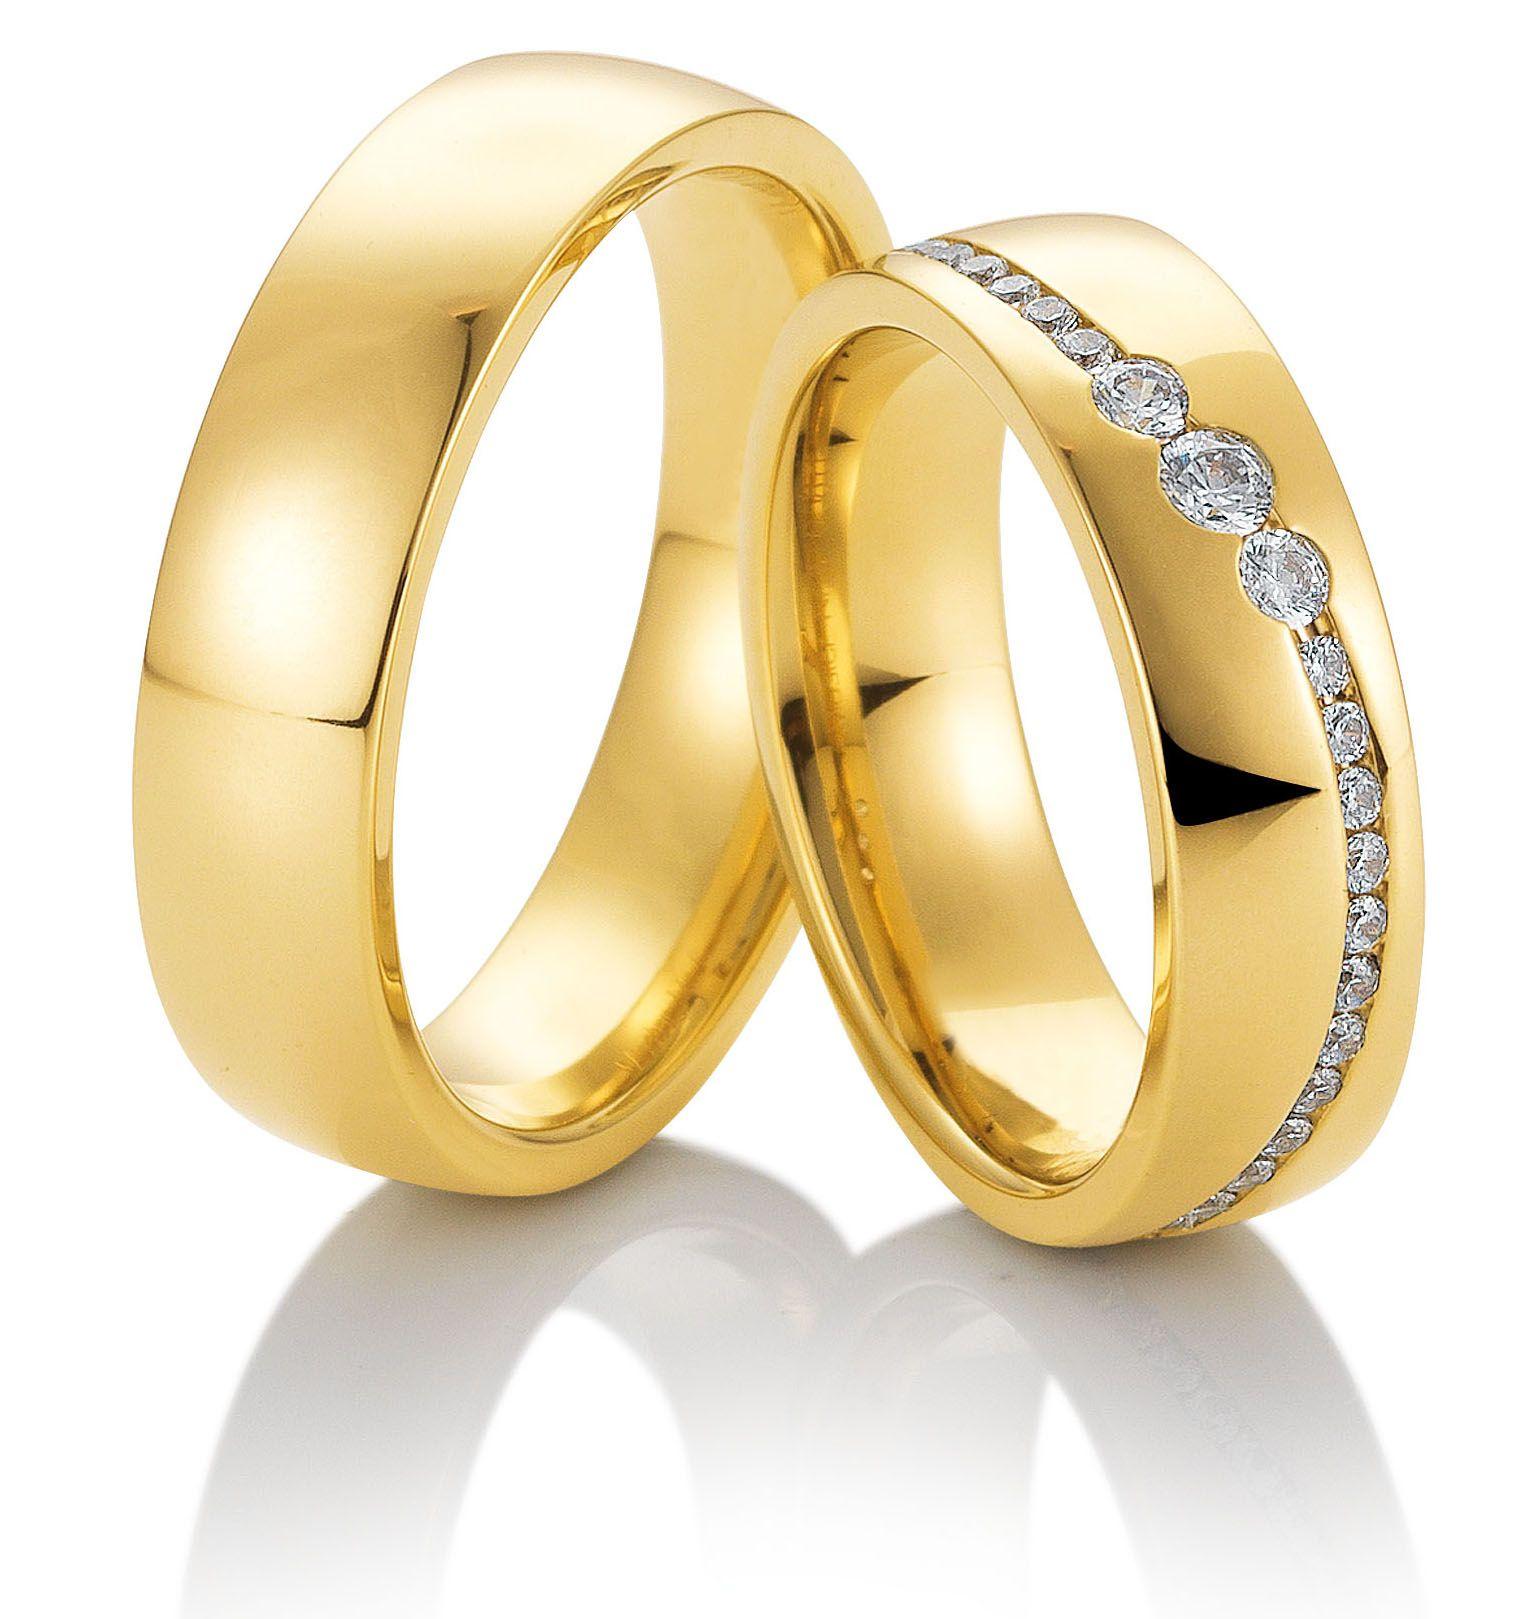 Eheringe Trauringe 49 81553 Gelbgold 585 Gold Jewelry Jewels